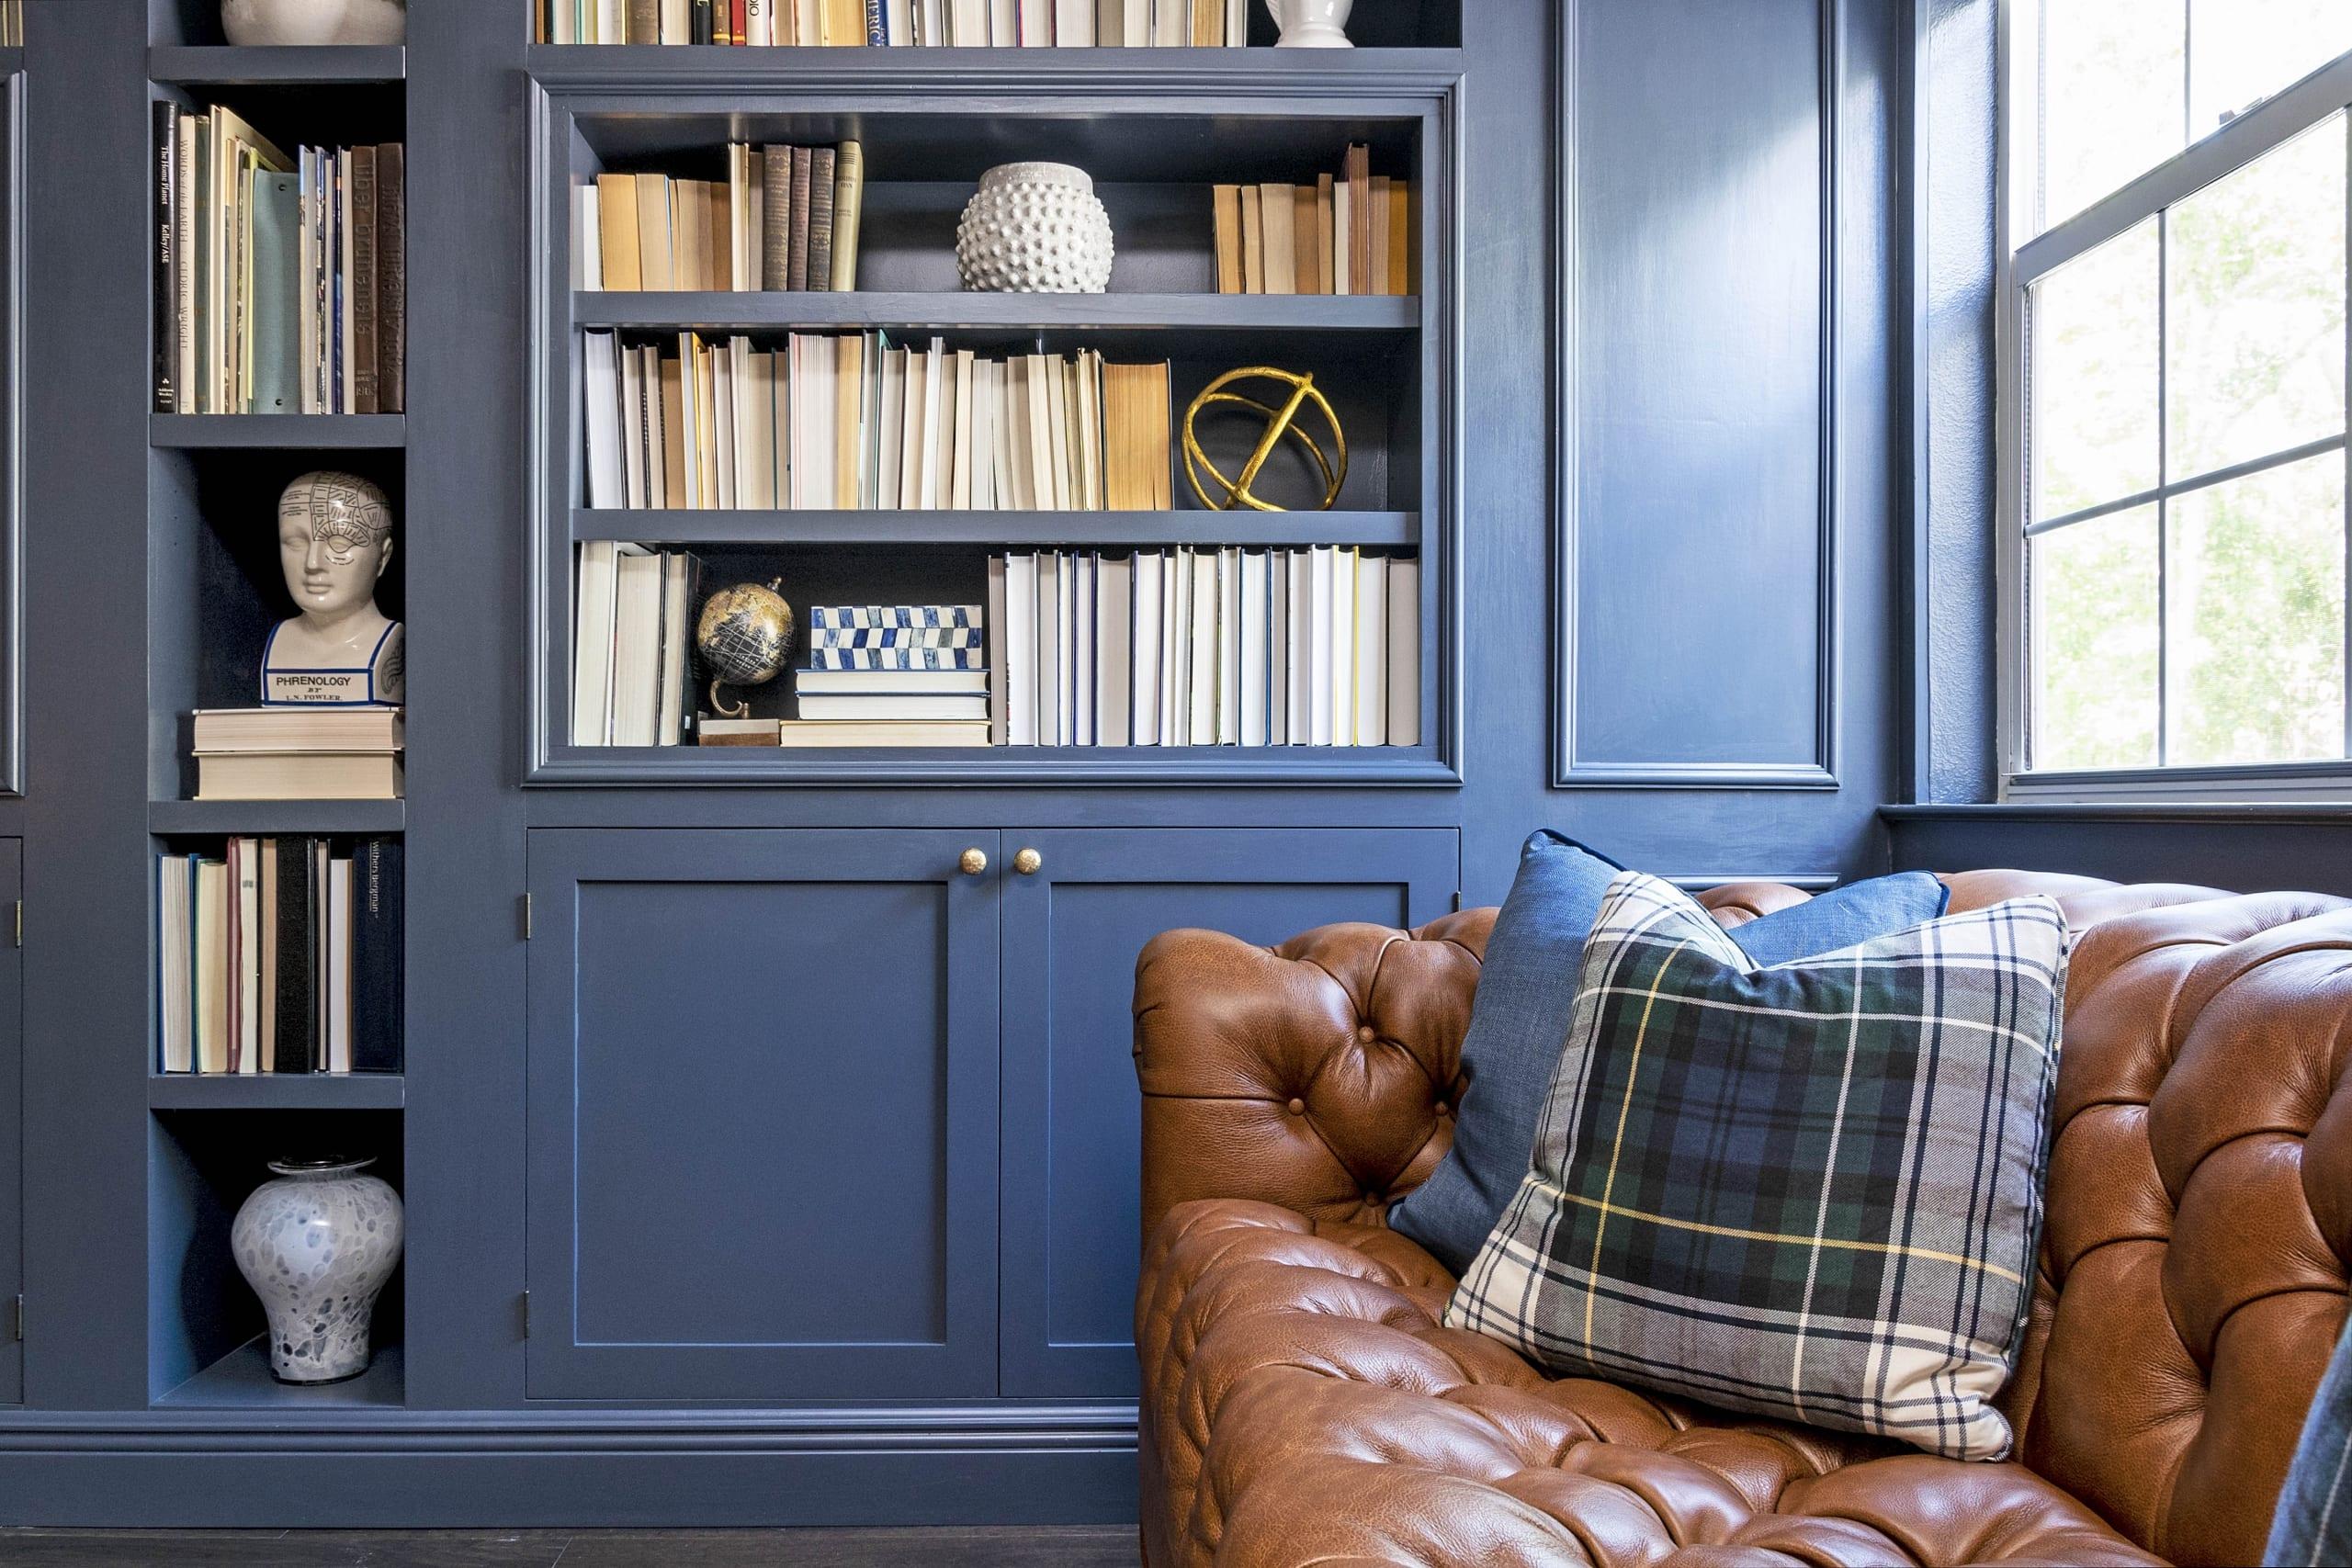 Kristine Bishop Design Dark Blue Book Shelf Cabinets Brown Leather Couch Blue Cushions Tartan Pillows